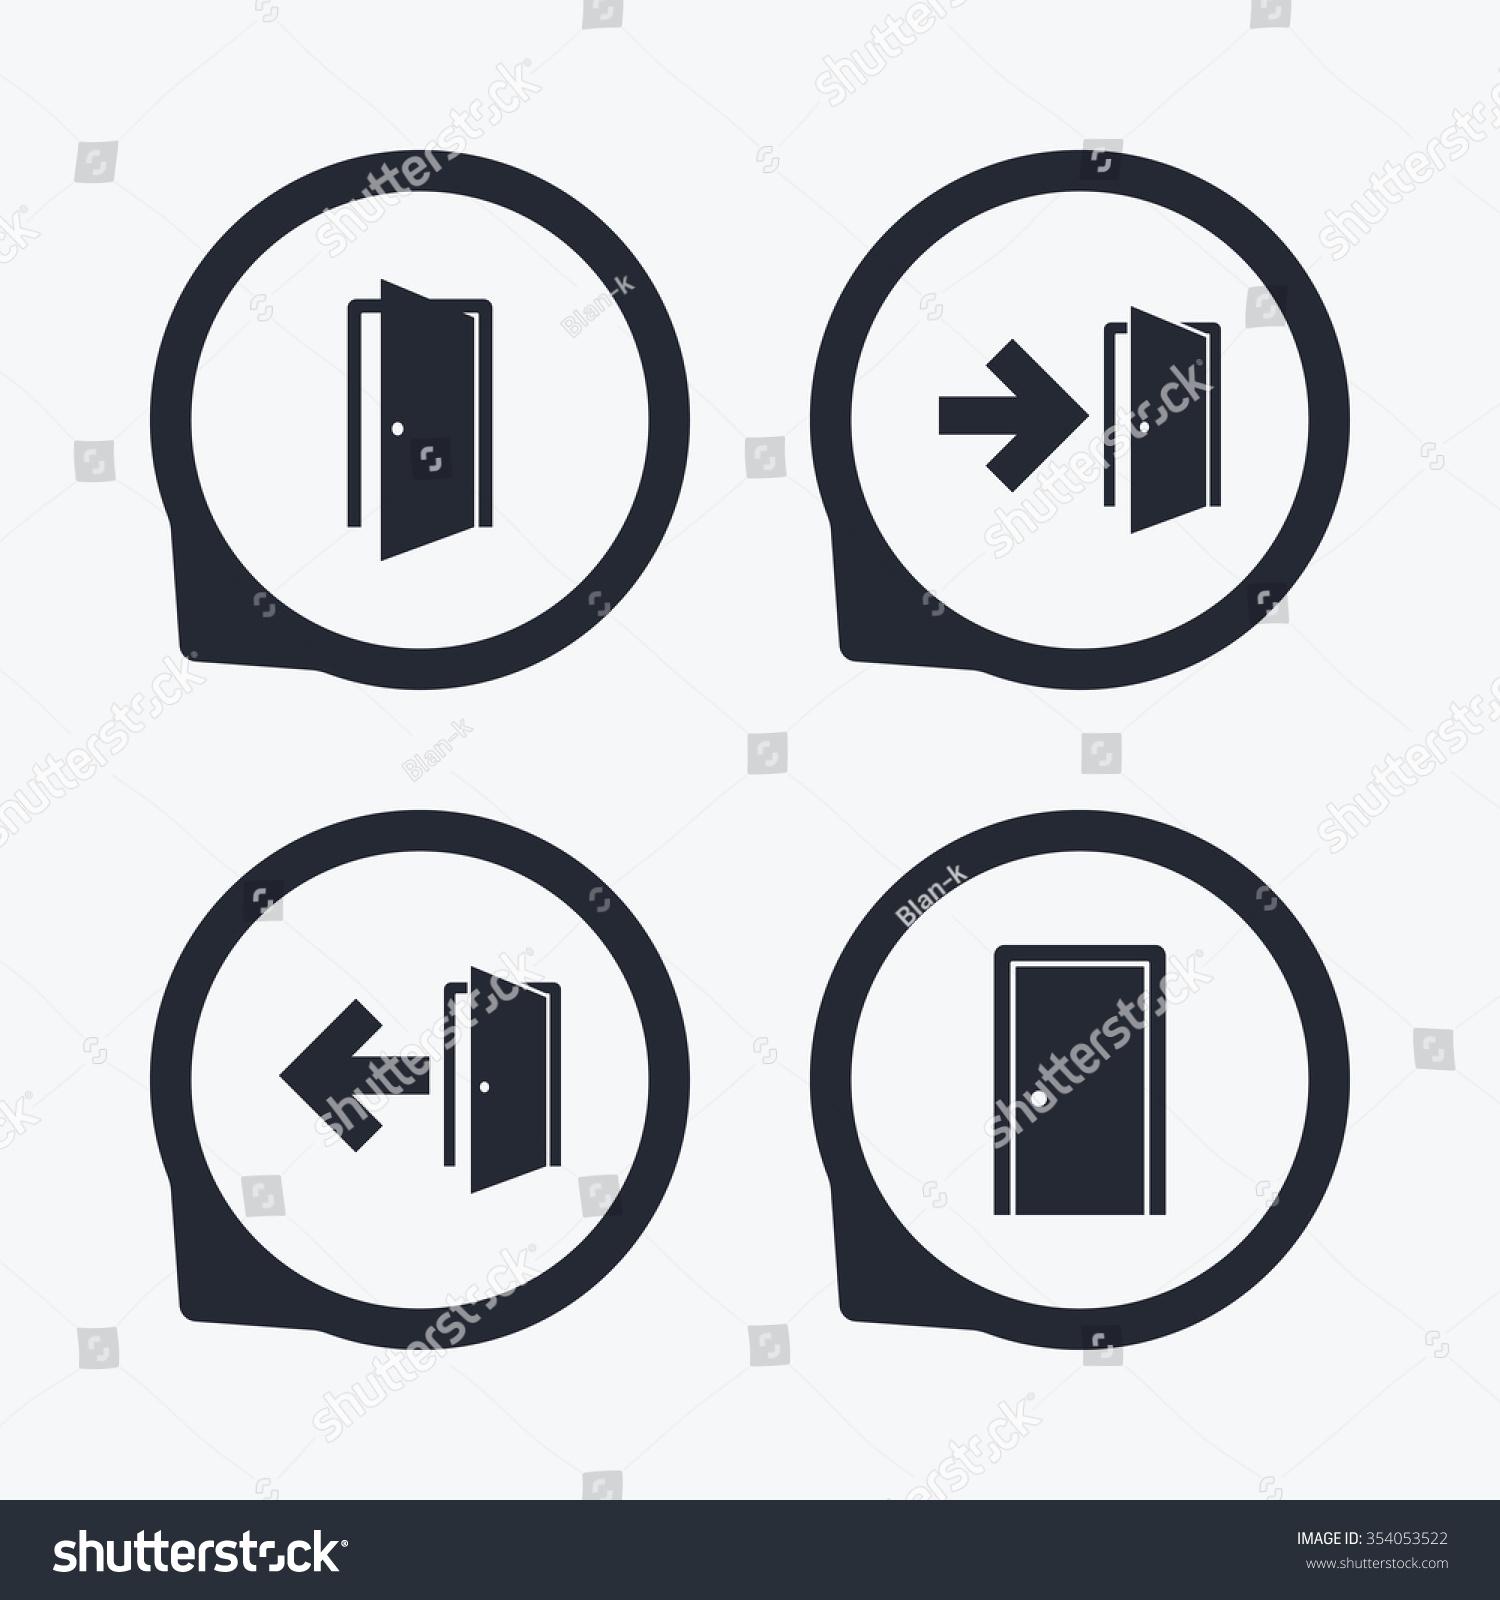 Doors icons emergency exit arrow symbols stock vector 354053522 emergency exit with arrow symbols fire exit signs flat icon pointers buycottarizona Images